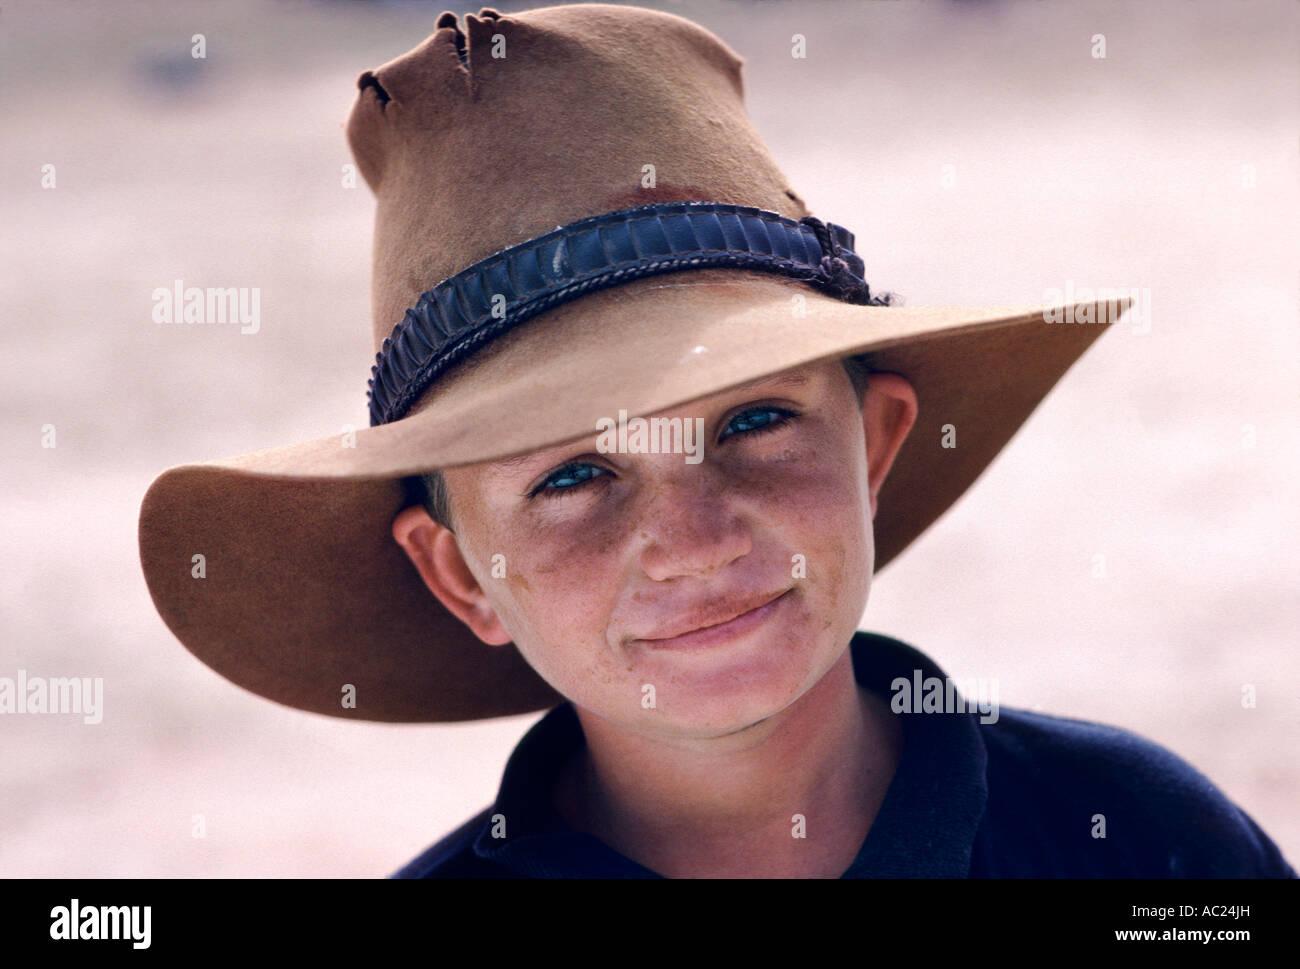 1815fe4f8b8 Face Akubra Hat Stock Photos   Face Akubra Hat Stock Images - Alamy